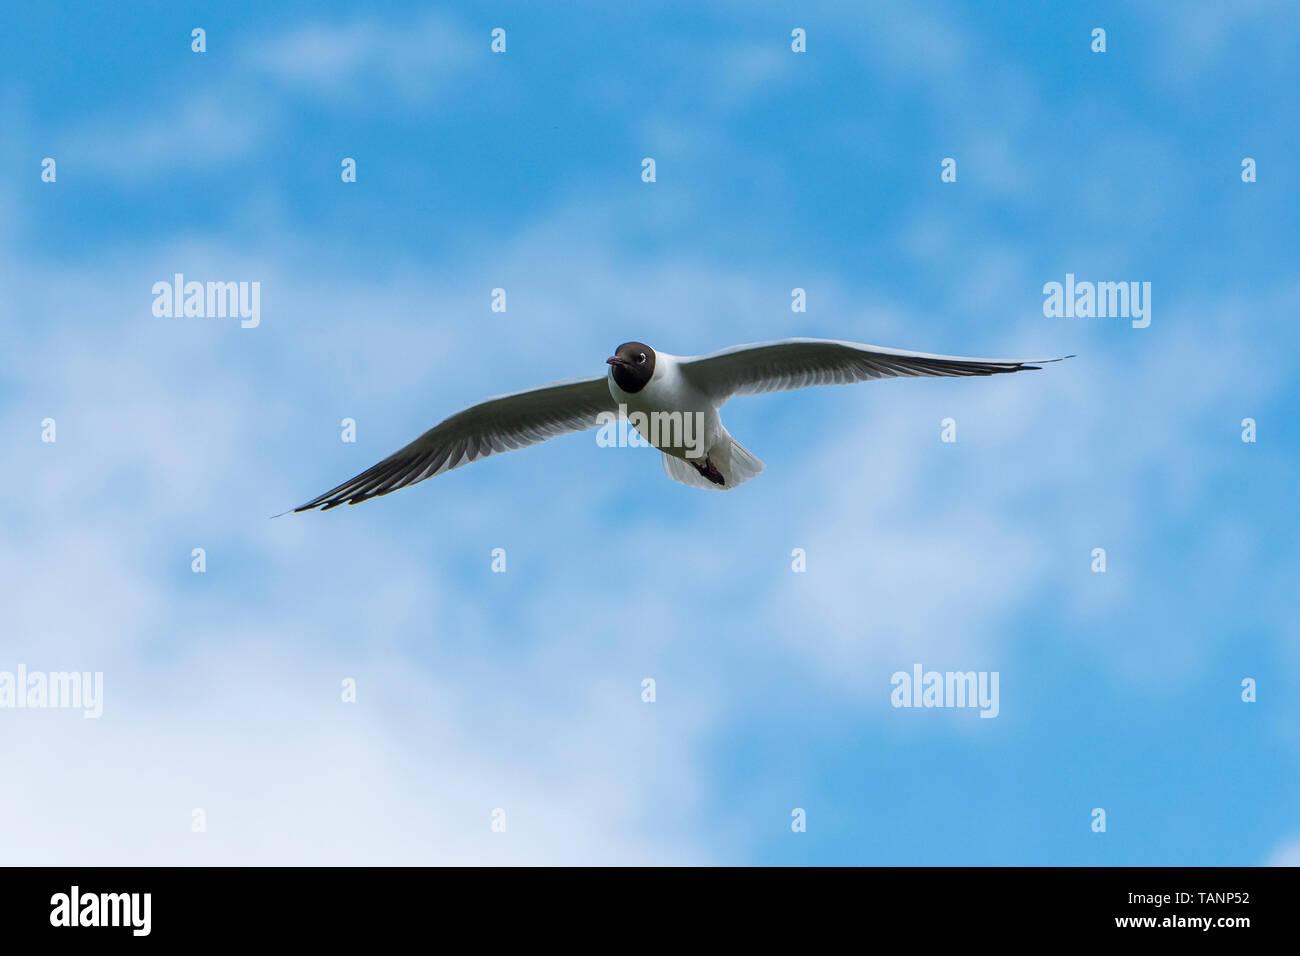 Black headed gull in flight - Stock Image